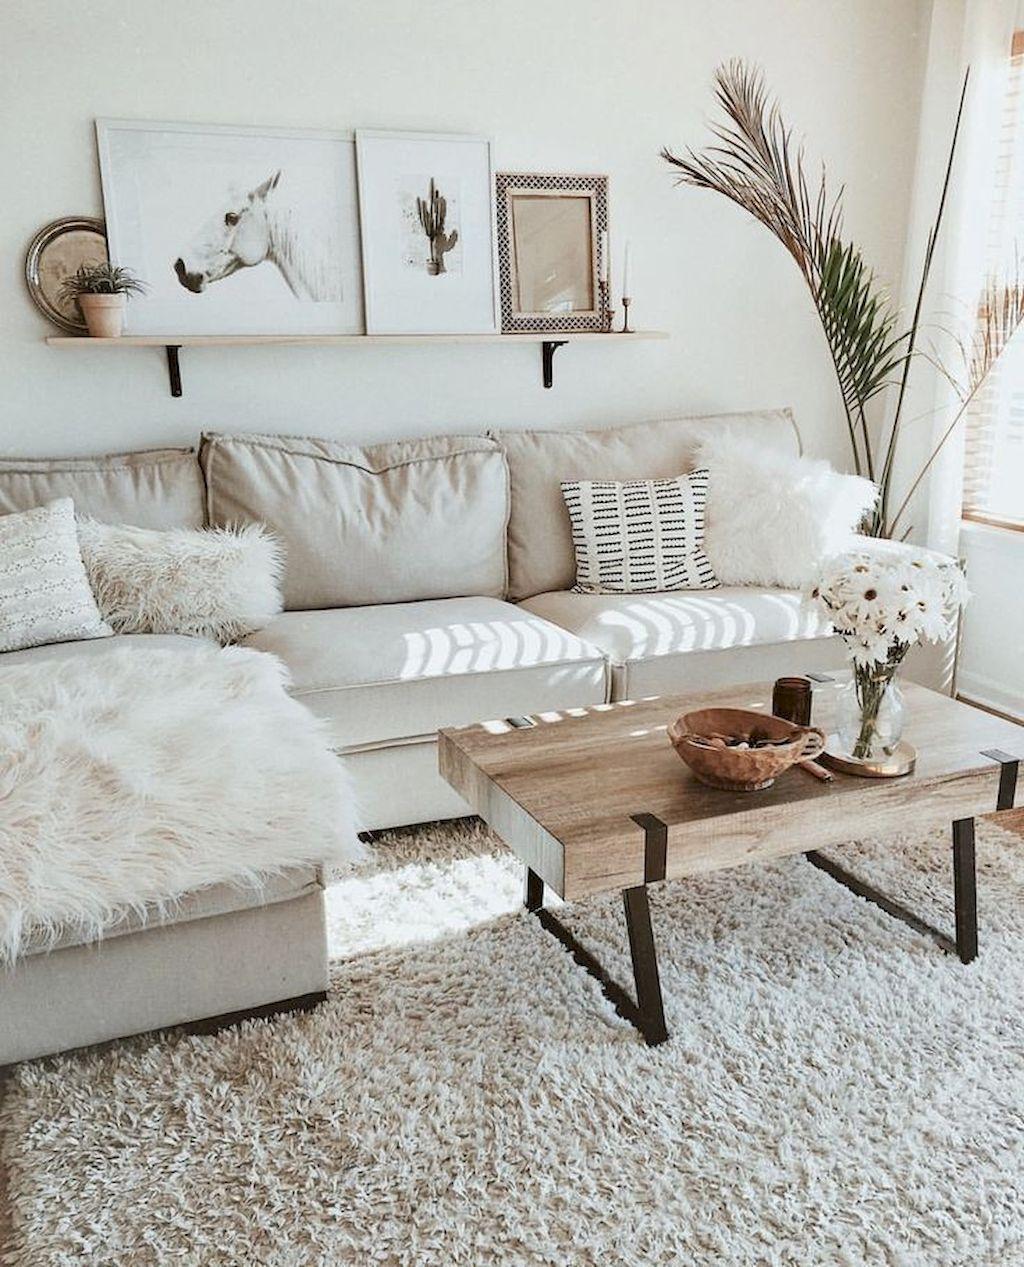 Photo of 50+ minimalist furniture ideas for 2019 | Elonahome.com